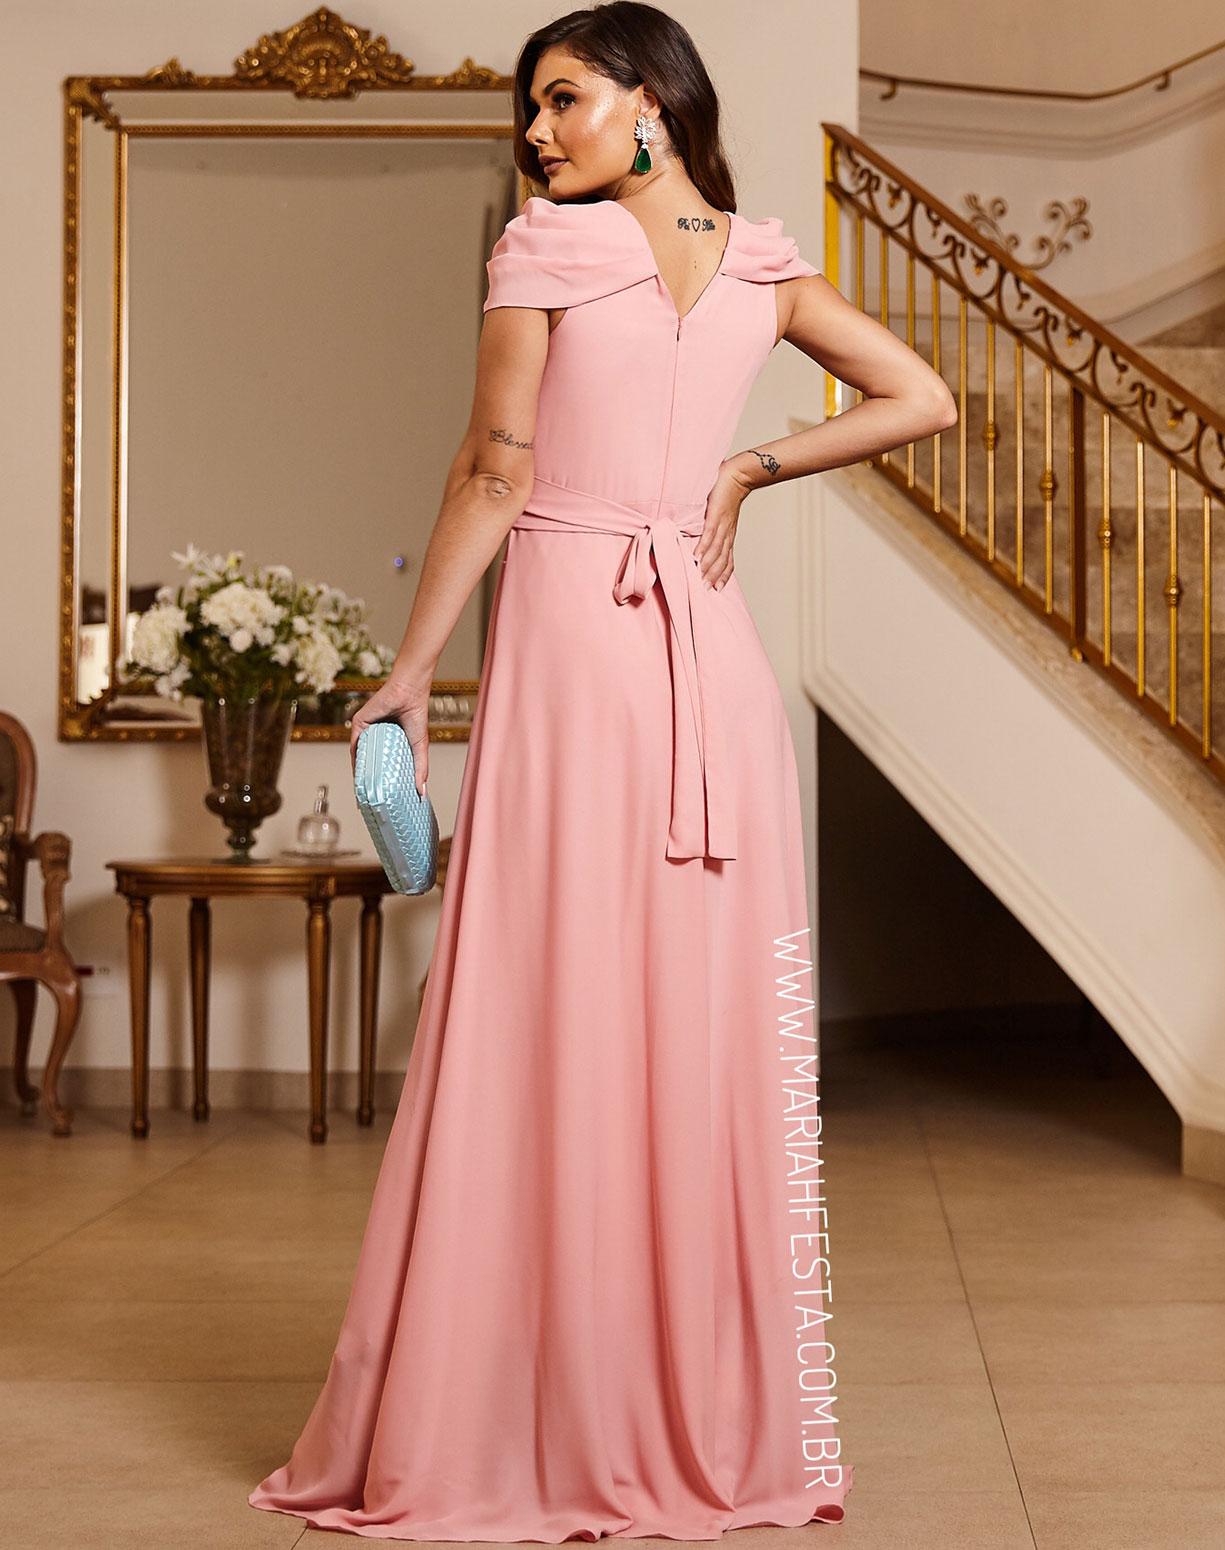 Vestido Rosê com Manga Drapeada